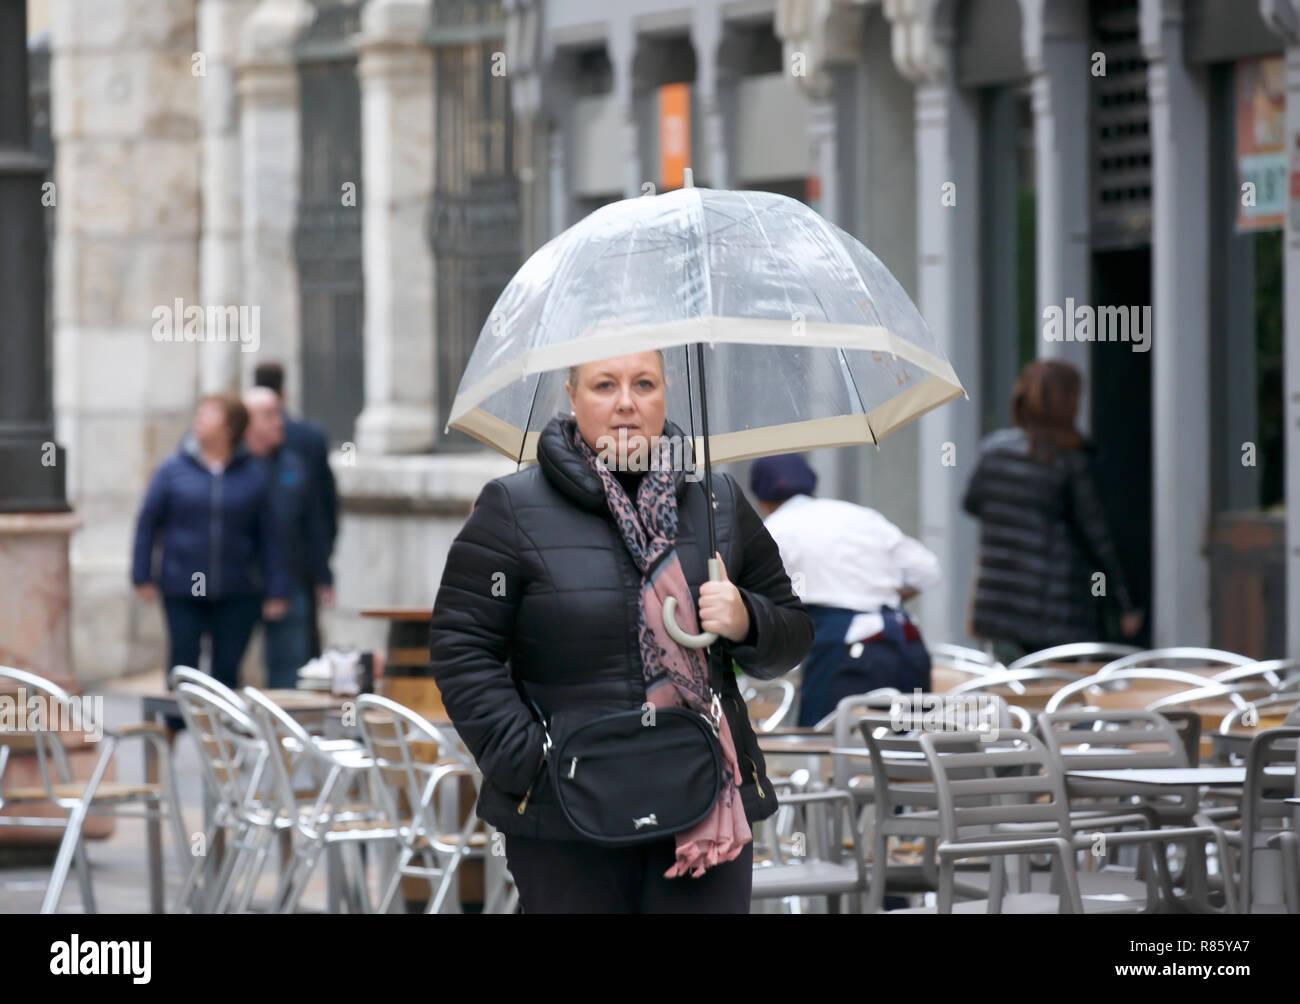 Cartagena,Spain,13th December 2018,Heavy rain in Cartagena, Spain.Credit: Keith Larby/Alamy Live News - Stock Image